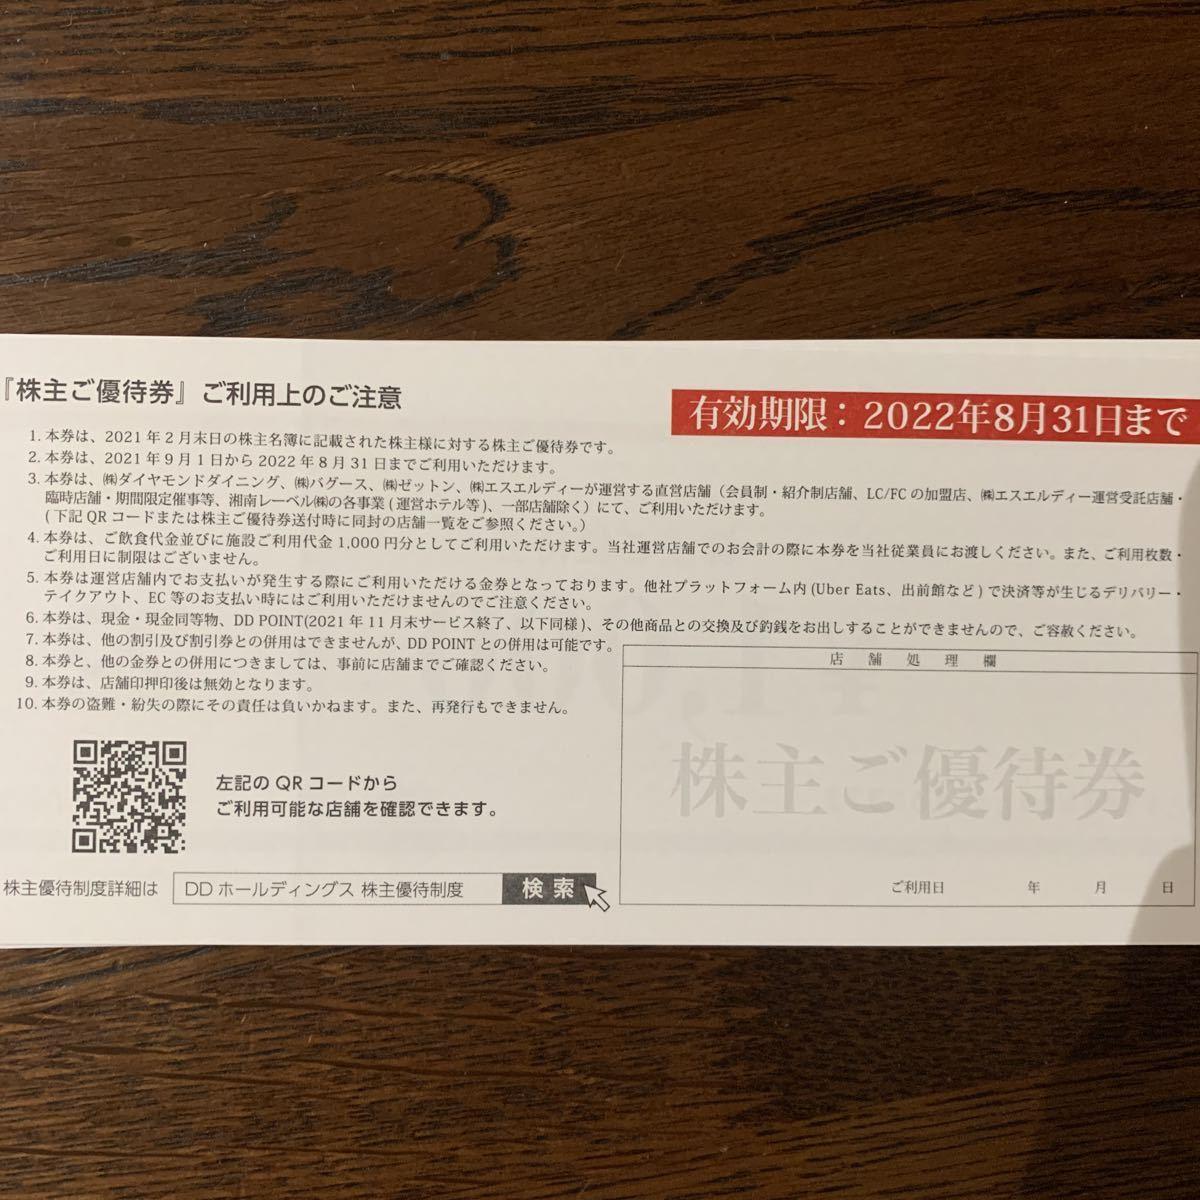 DDホールディングス 株主優待 12,000円_画像2